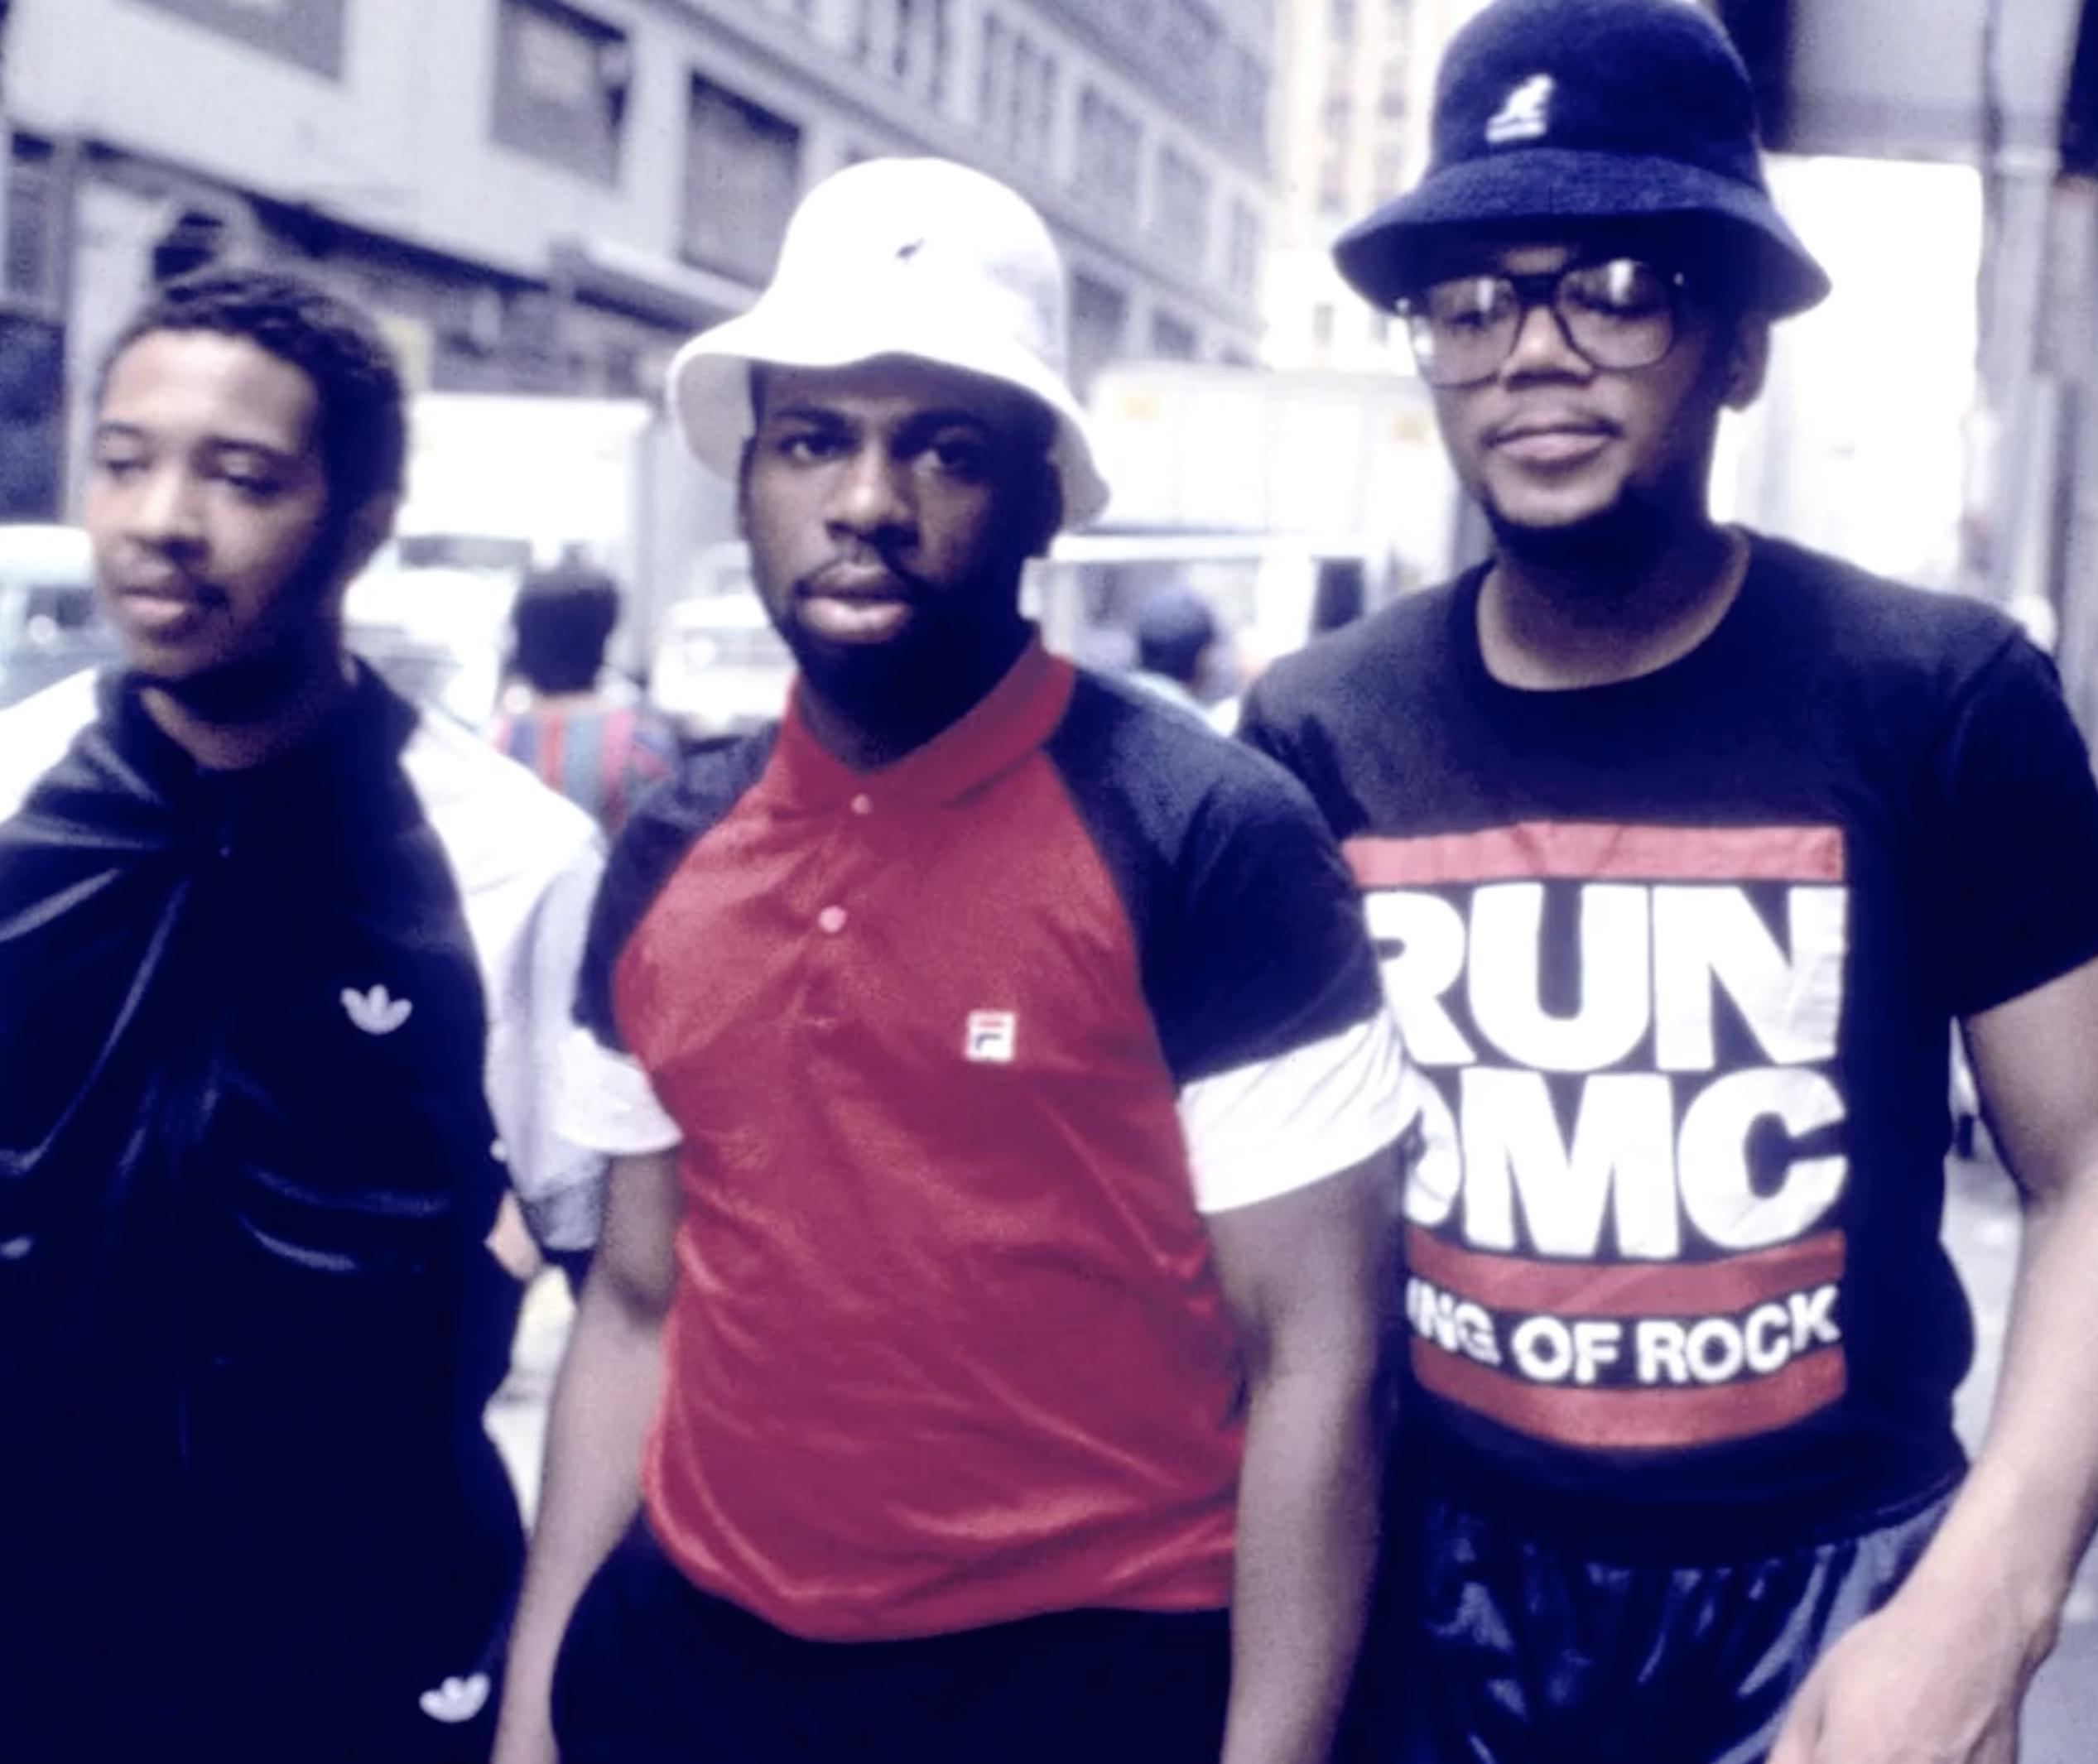 Run DMC e1616421402115 10 Tricky-Tricky Truths About Hip Hop Legends Run-DMC